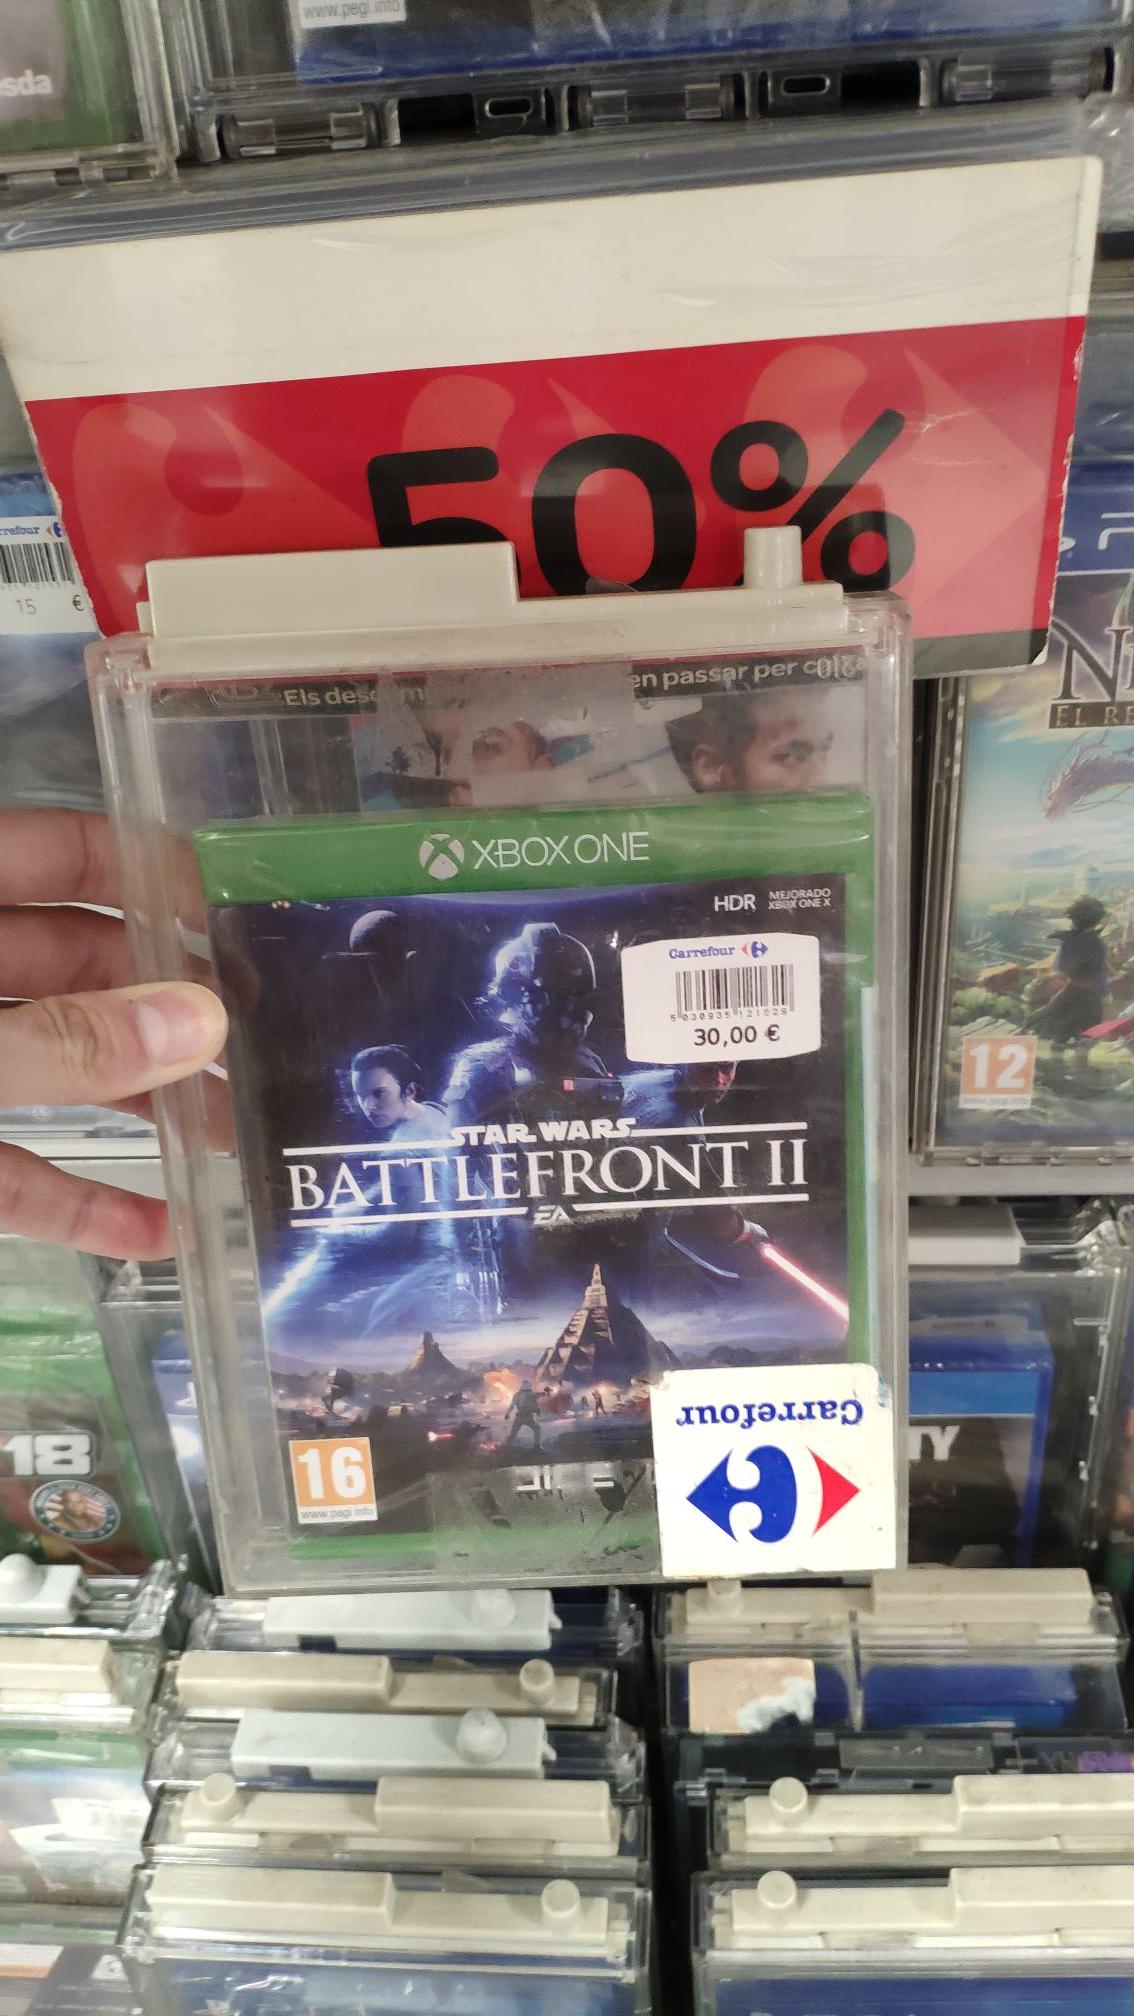 Star Wars Battlefront II Xbox One (Formato físico) - Carrefour